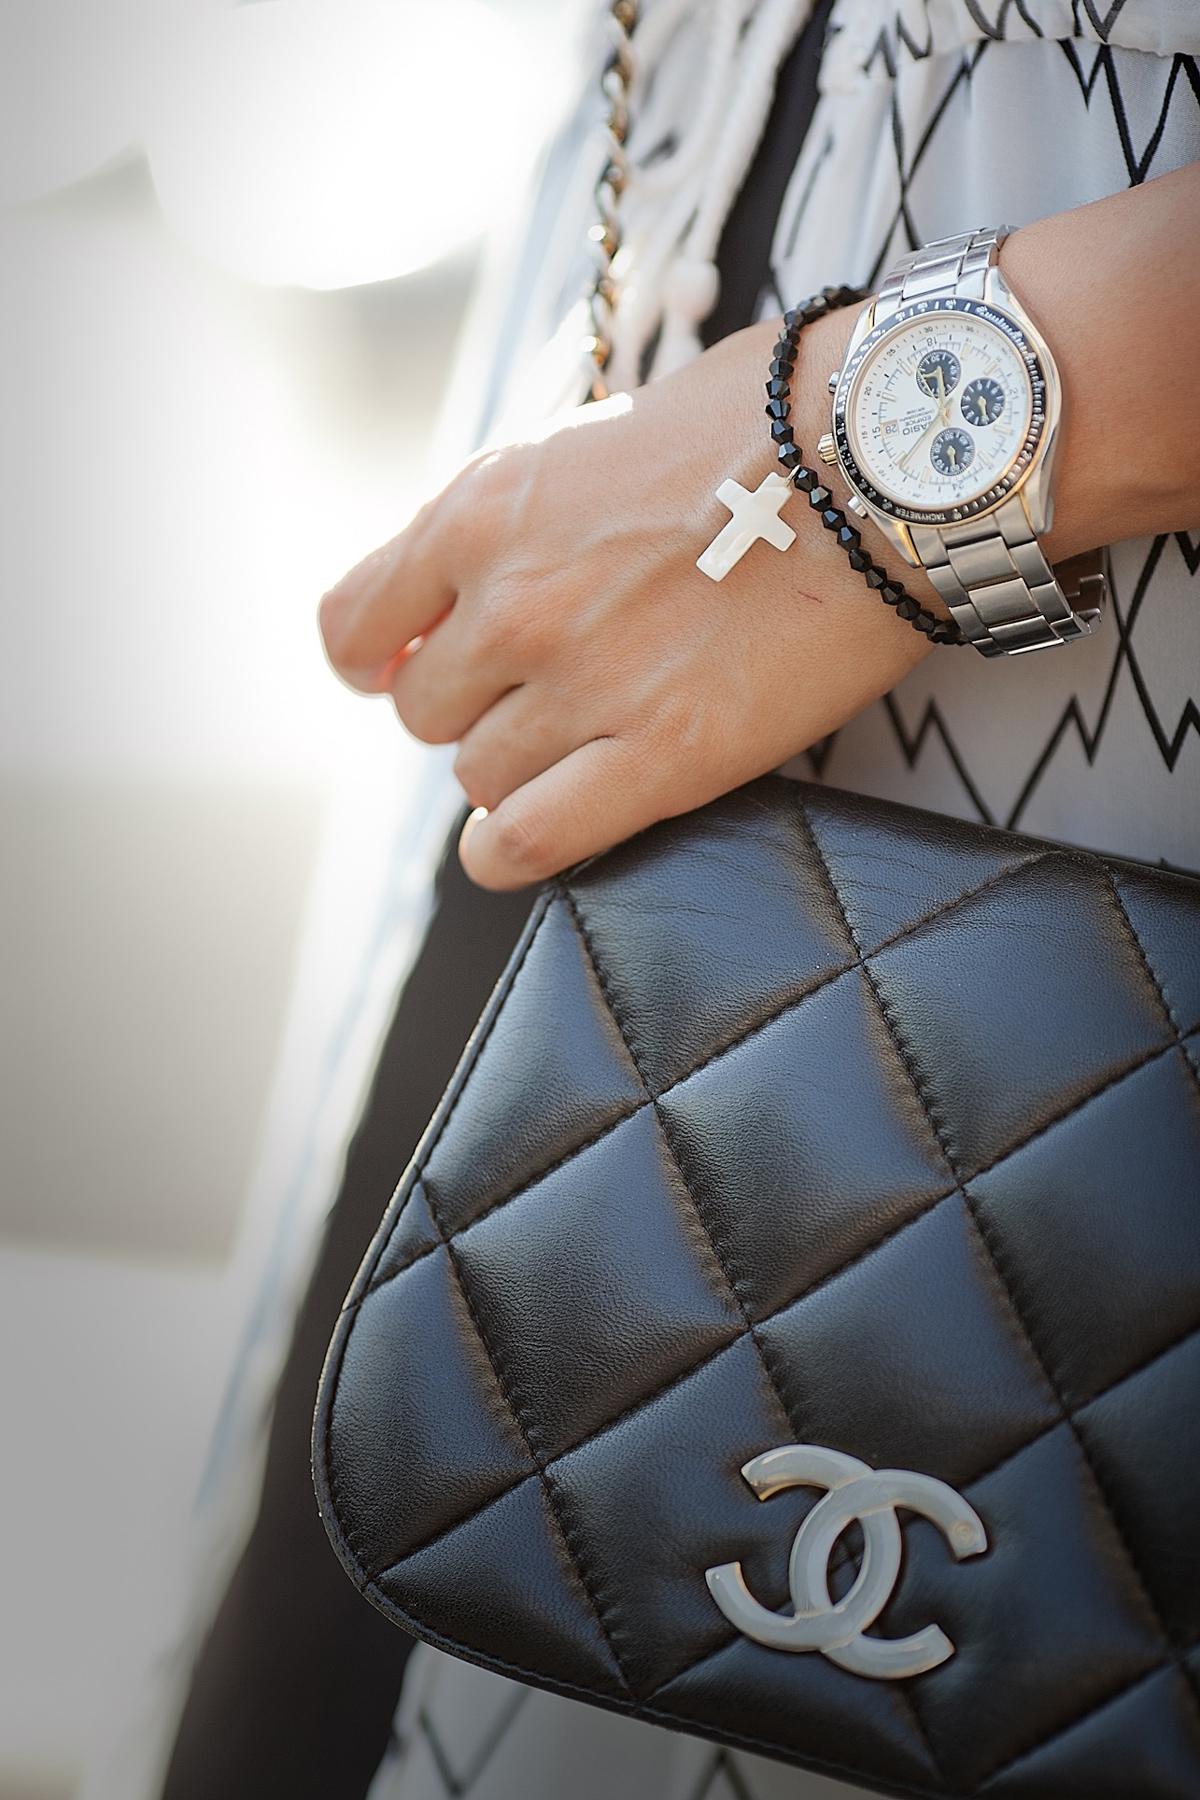 vintage-chanel-bag-casio-watch-galant-girl